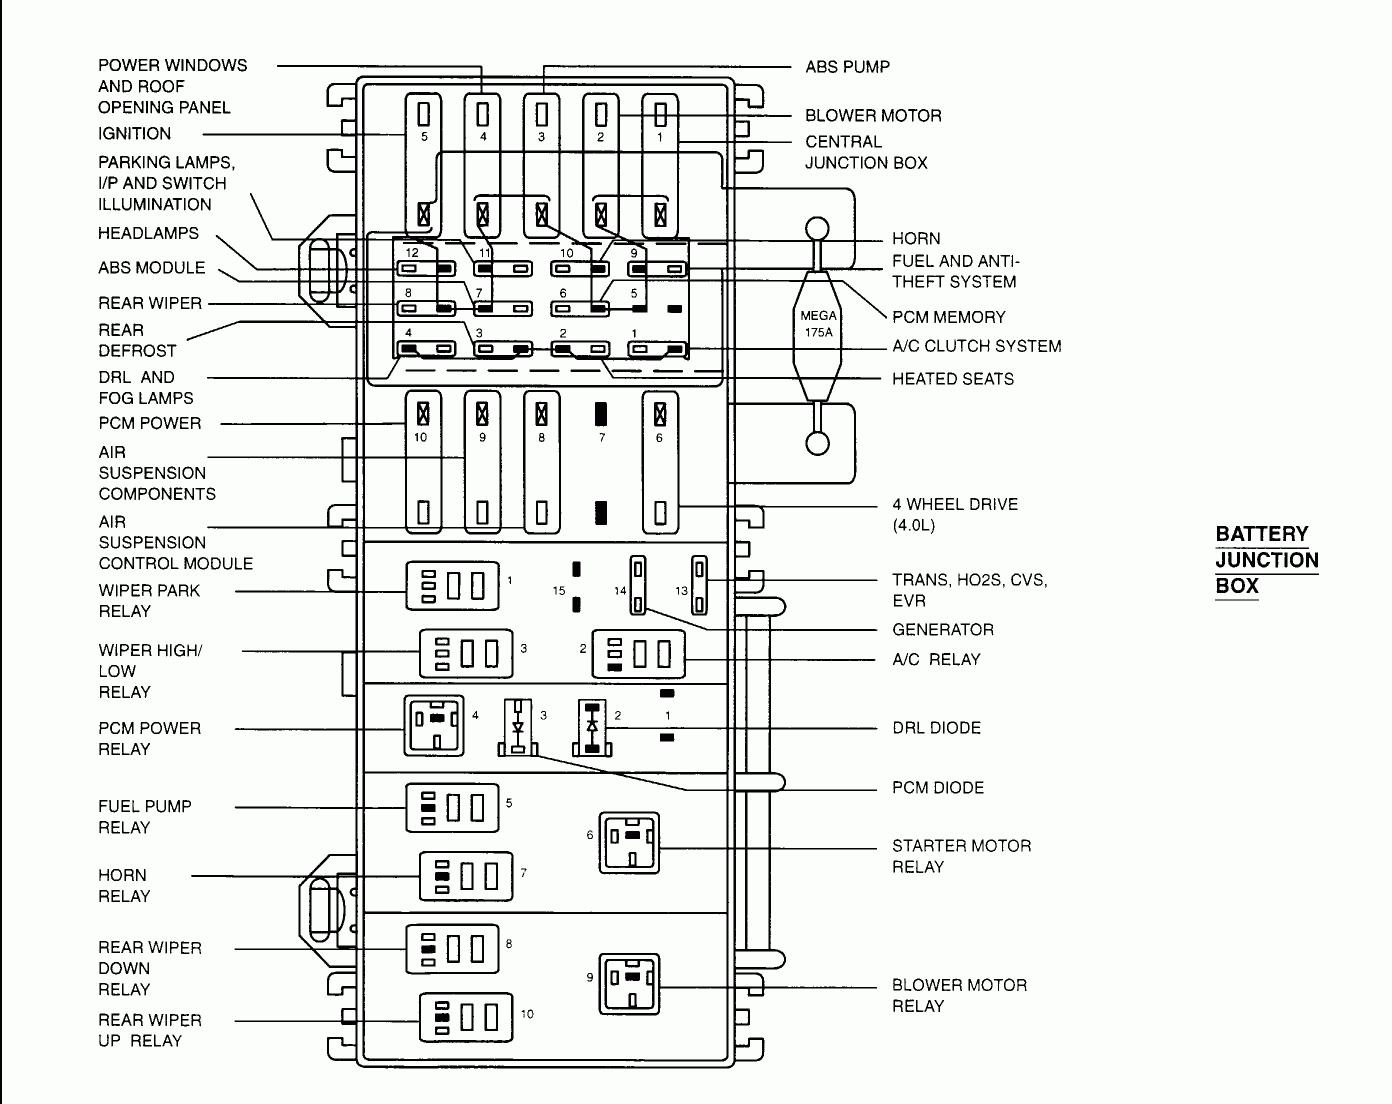 [SCHEMATICS_4NL]  WY_4281] Explorer Xlt Fuse Box Diagram For 99 Wiring Diagram | 1999 Mountaineer Fuse Diagram |  | Elinu Shopa Kapemie Mohammedshrine Librar Wiring 101